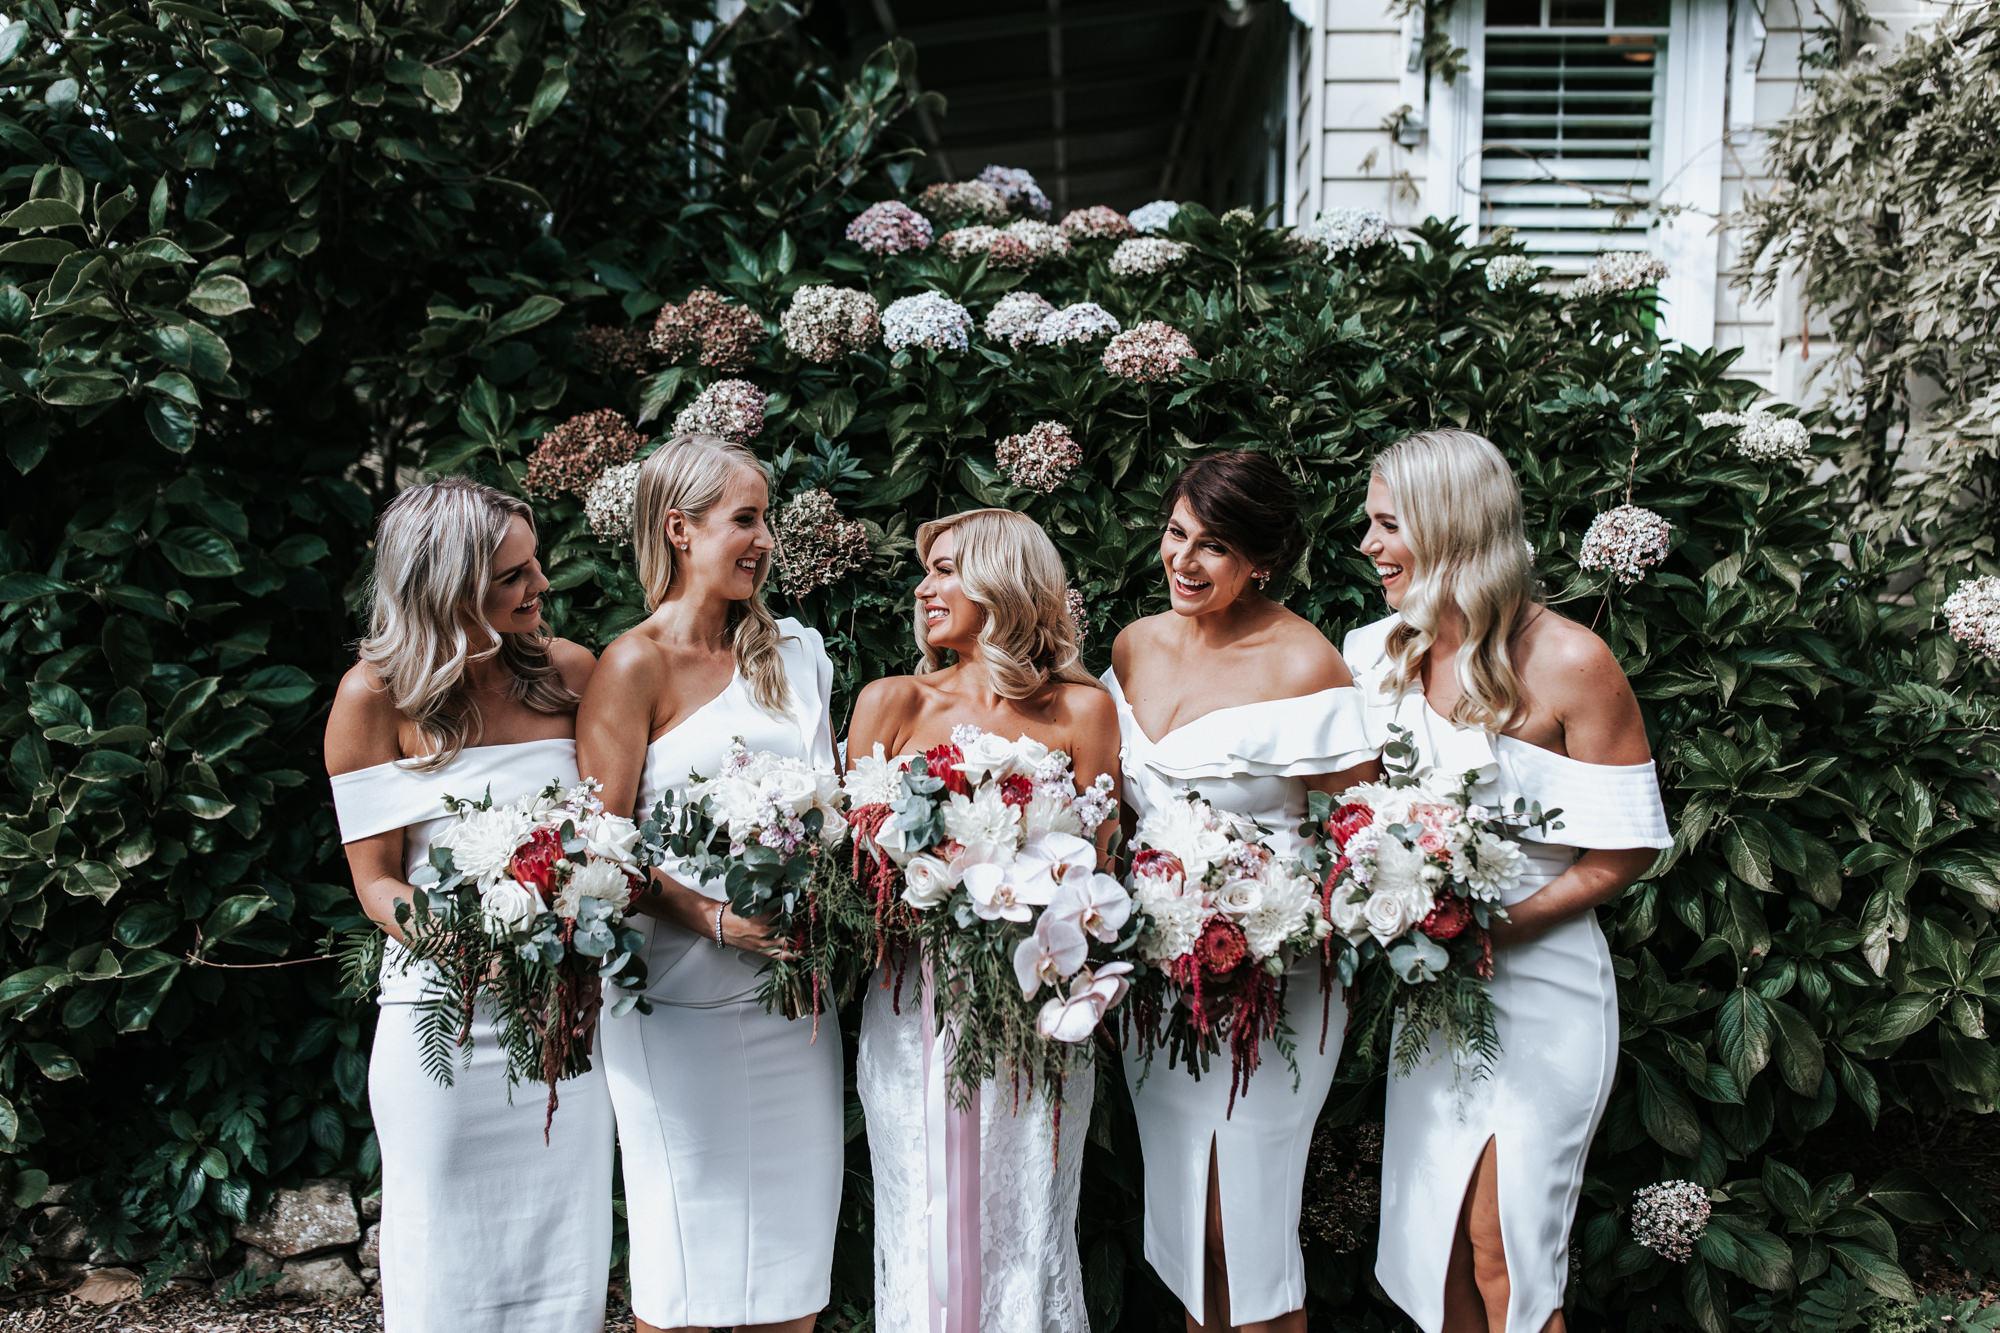 mali-brae-wedding-natalie-scott-baldwin-7.jpg